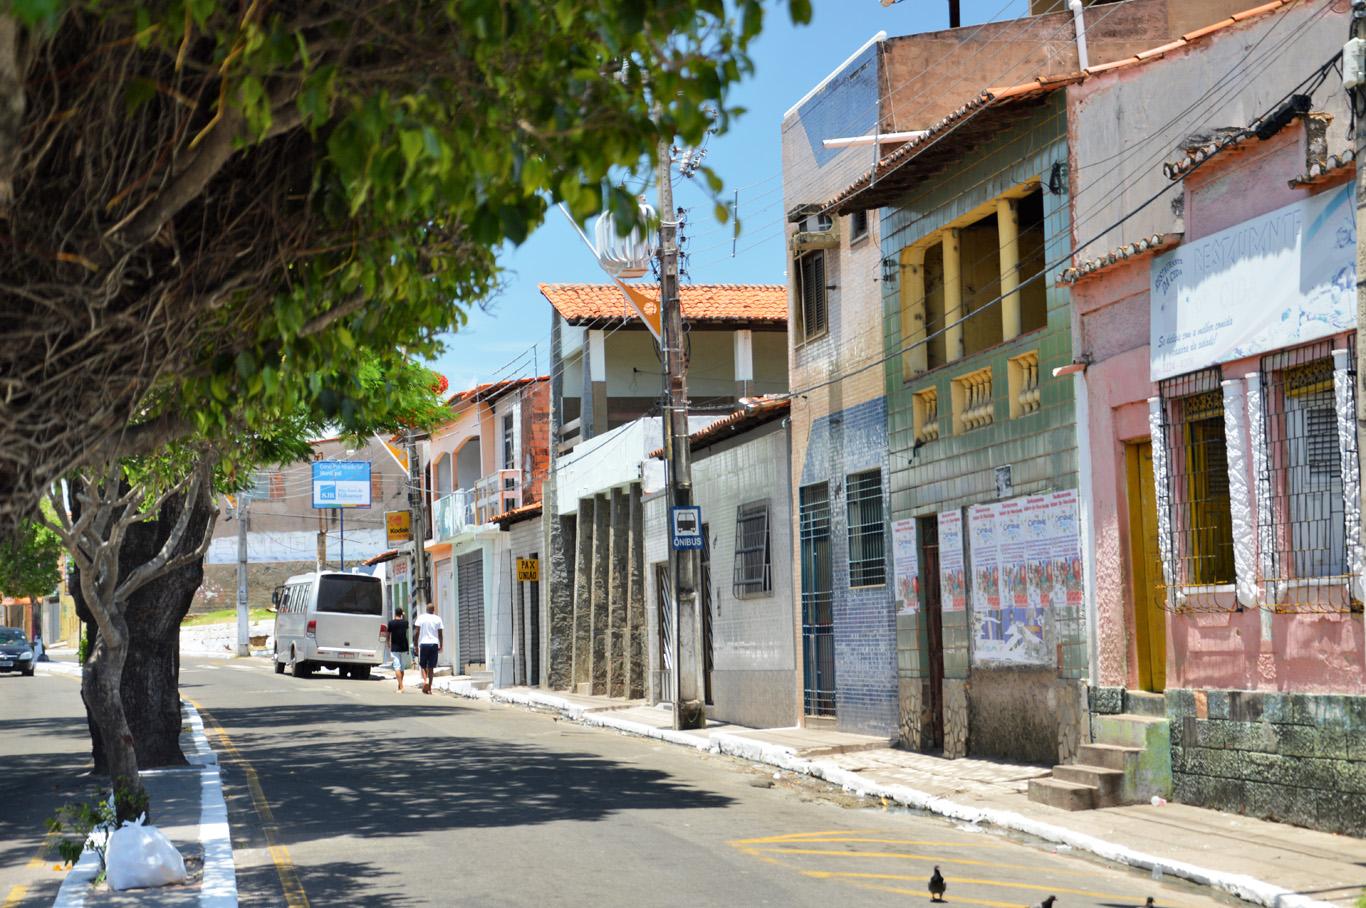 Sao Jose de Ribamar